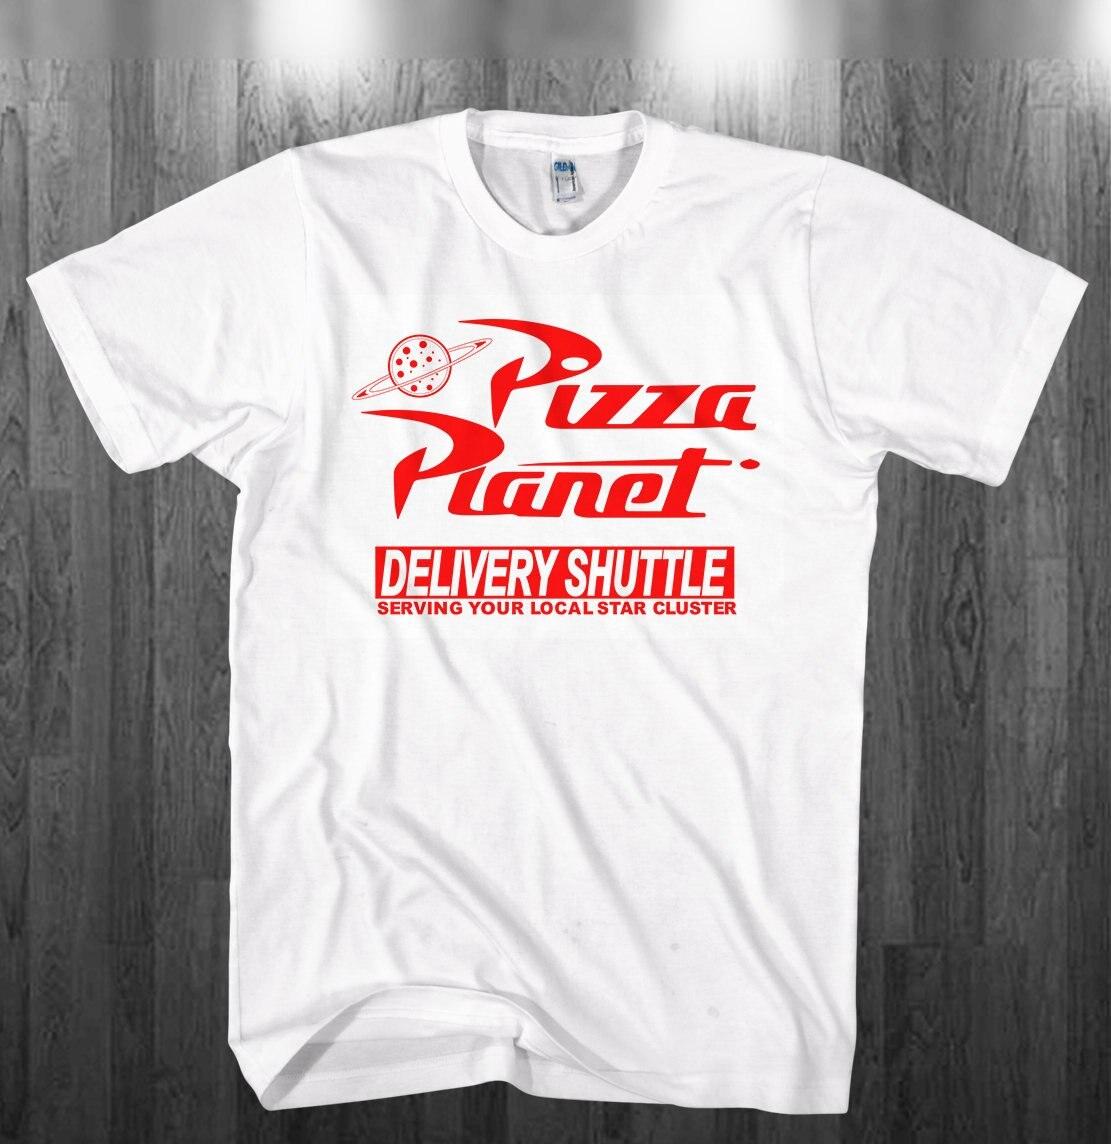 2020 de Pizza planeta camiseta de las mujeres-juguete historia inspirado camiseta Unisex Pizza planeta GraphicTee divertido Harajuku camisa de Tumblr Tops